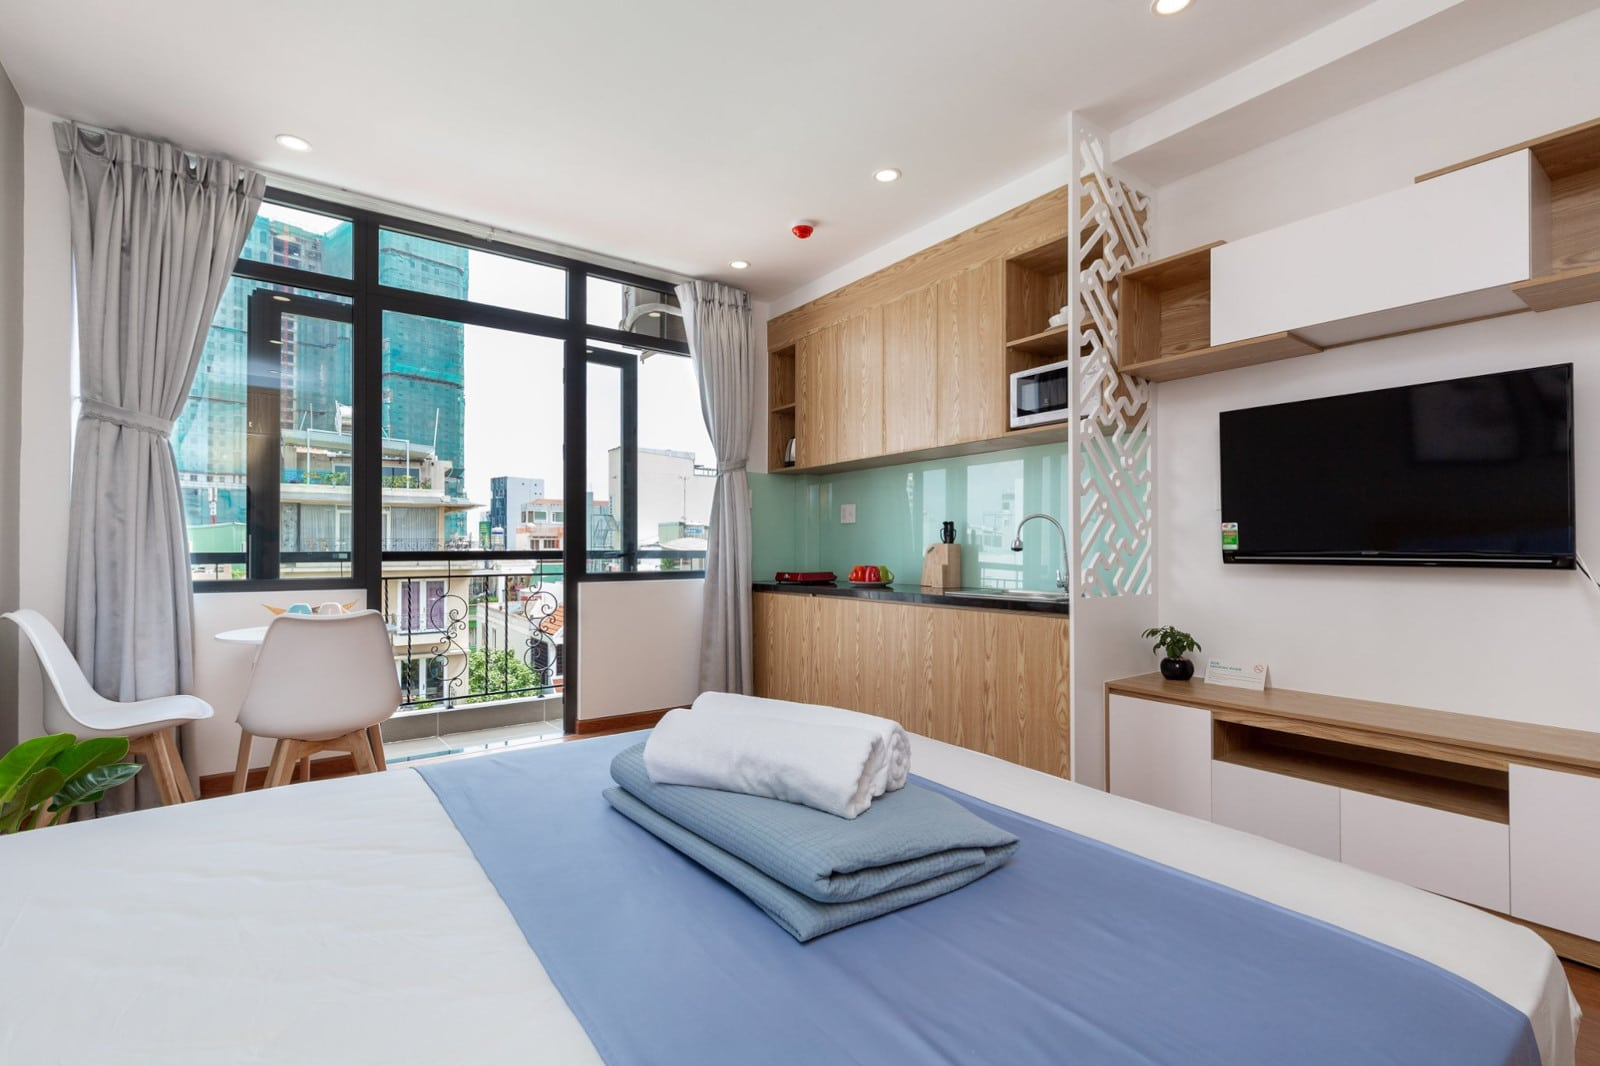 Image of a bedroom at the Cozrum Homes Lý Chính Thắng in HCMC, Vietnam